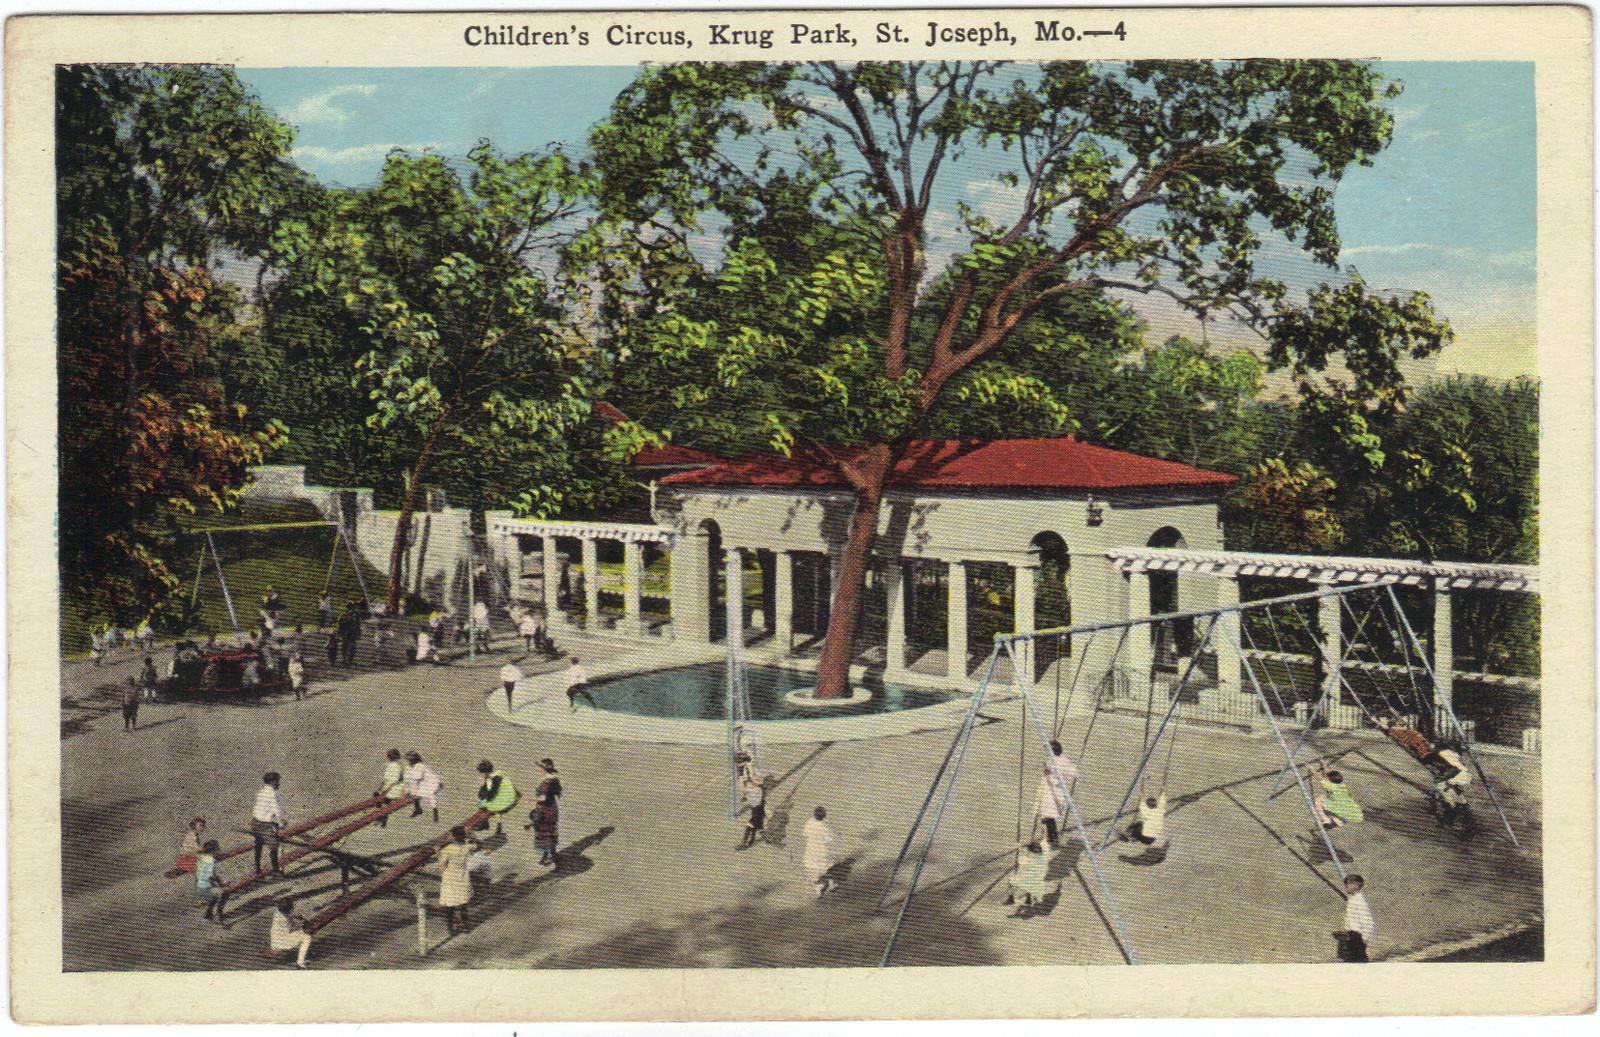 Children's Circus Krug Park St. Joseph Mo